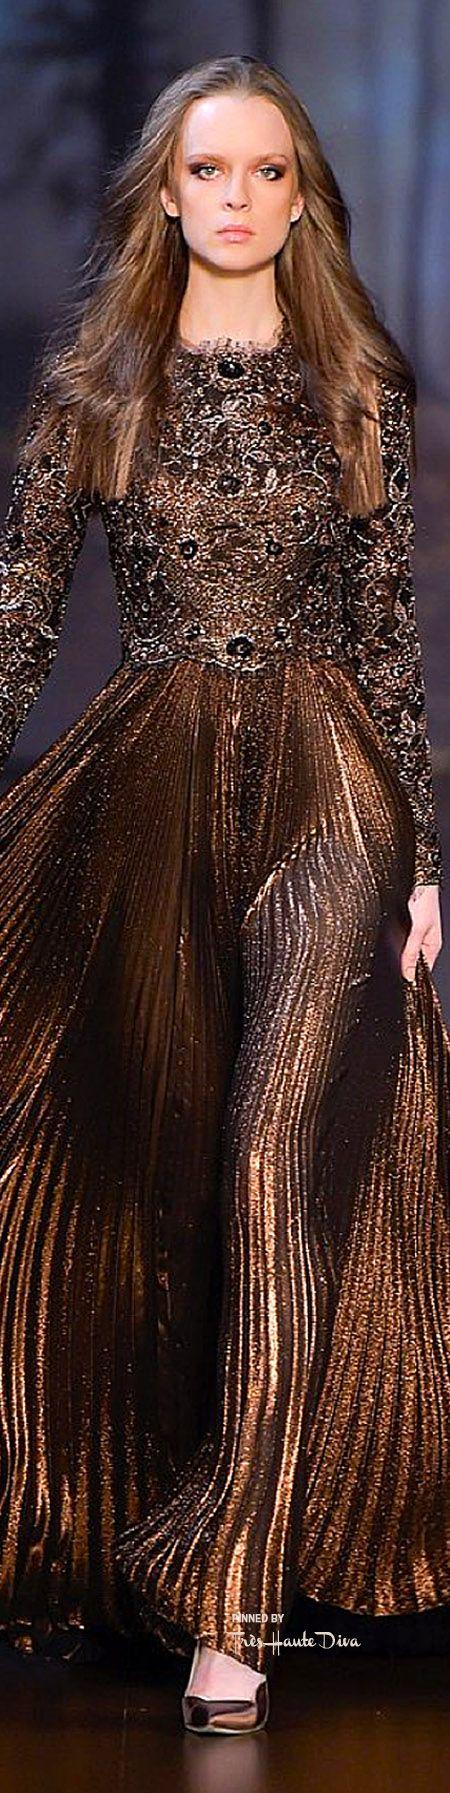 Ralph  Russo Haute Couture Fall 2015 ♔ Très Haute Diva alles für Ihren Stil - www.thegentlemanclub.de